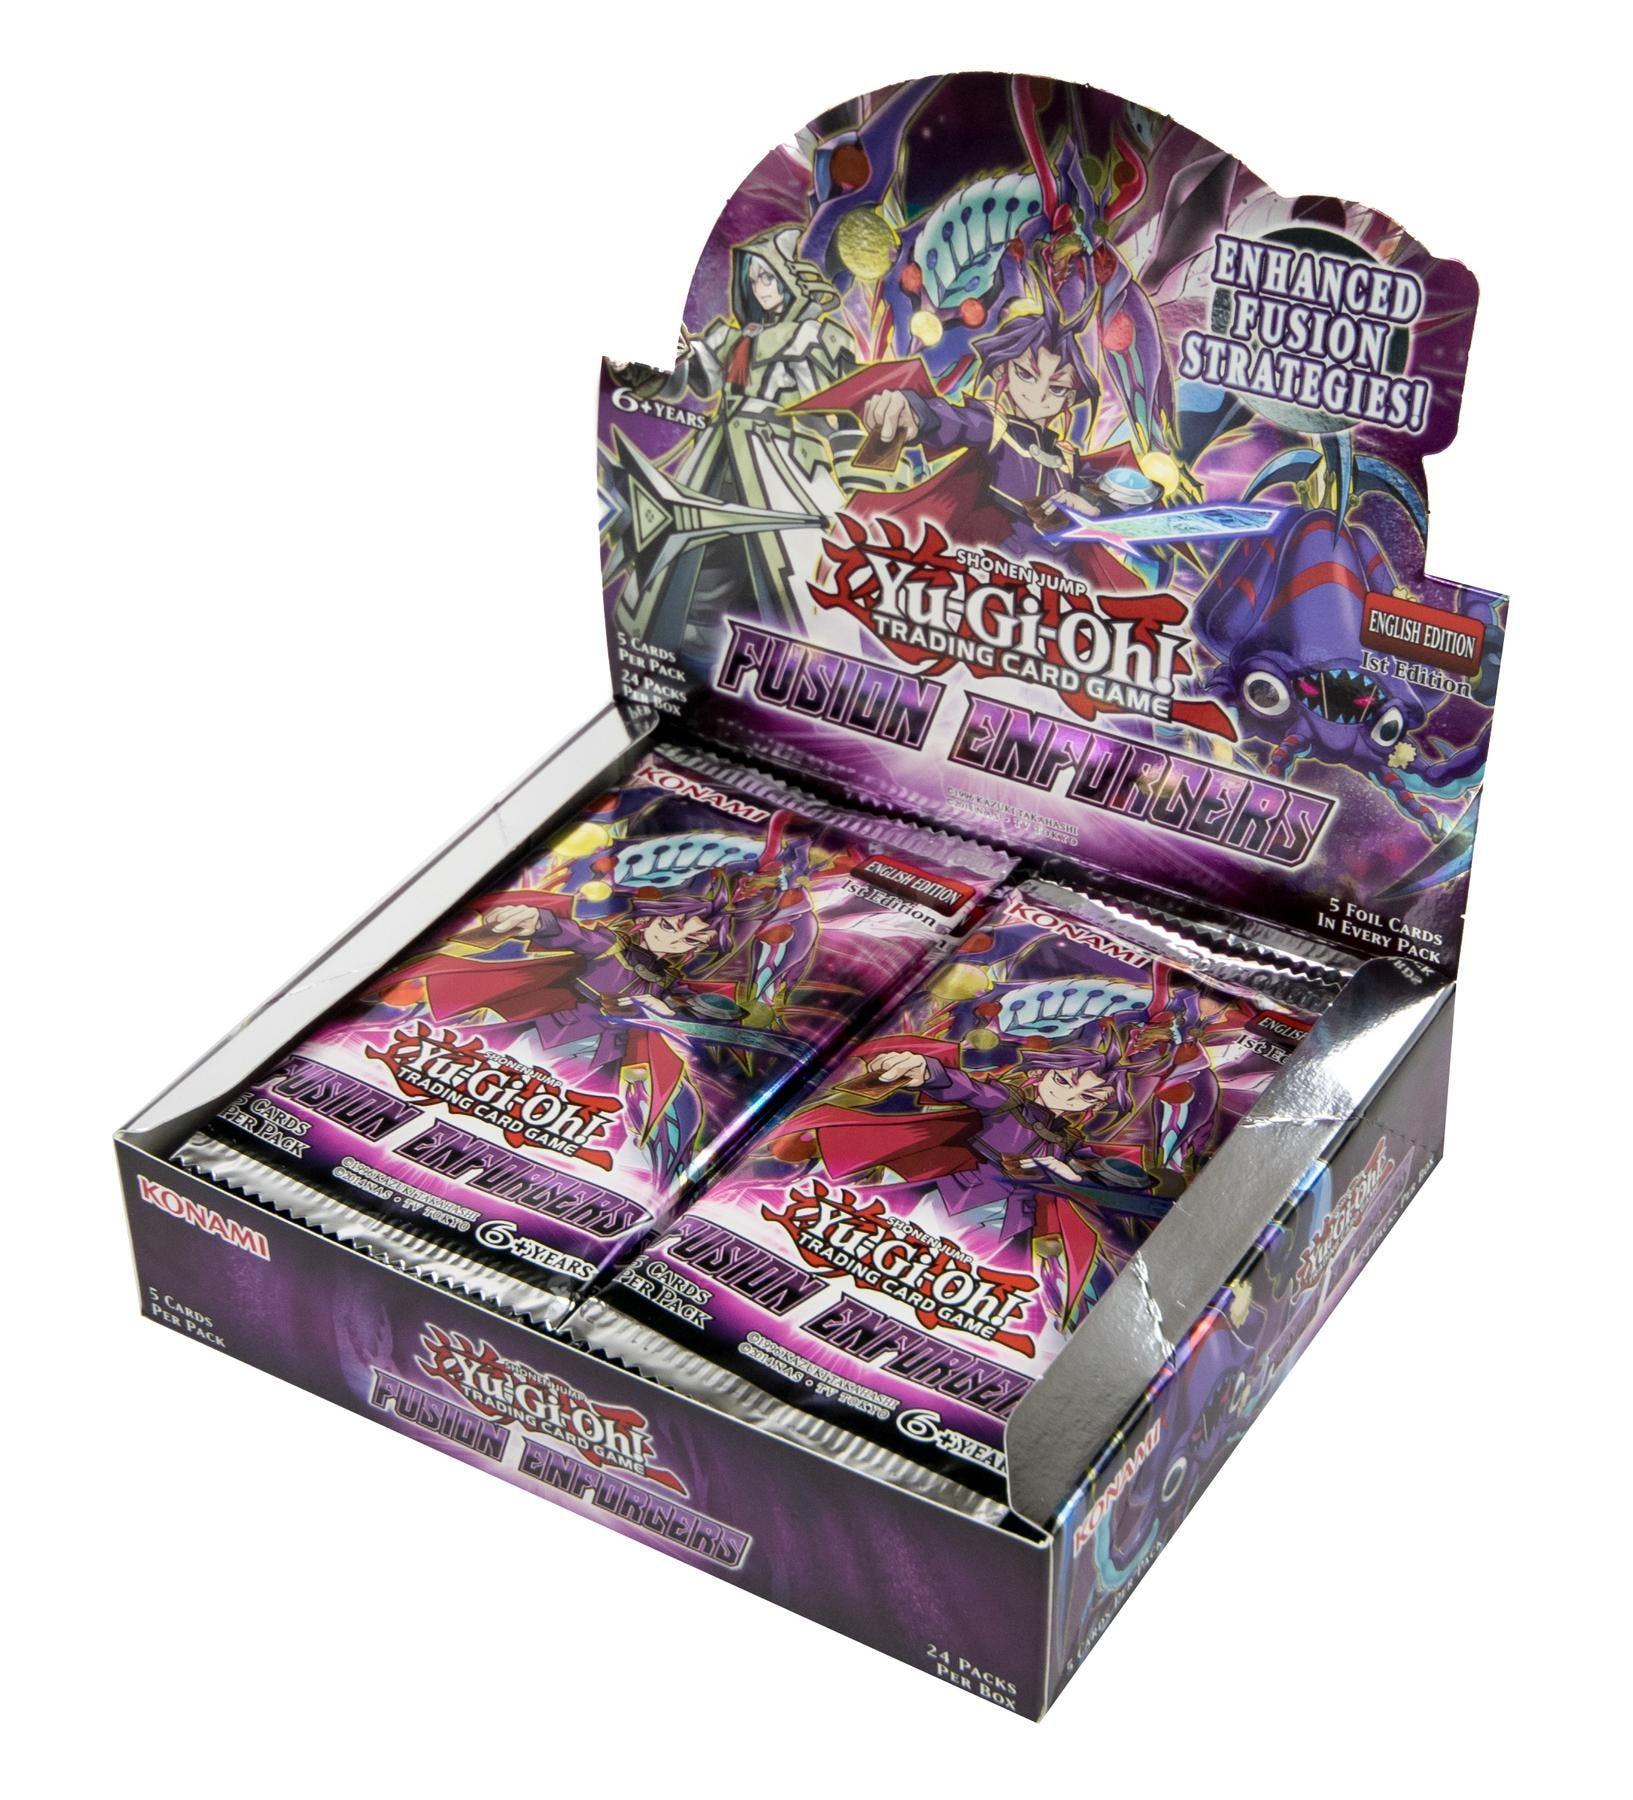 Yu-Gi-Oh Fusion Enforcers Booster Box